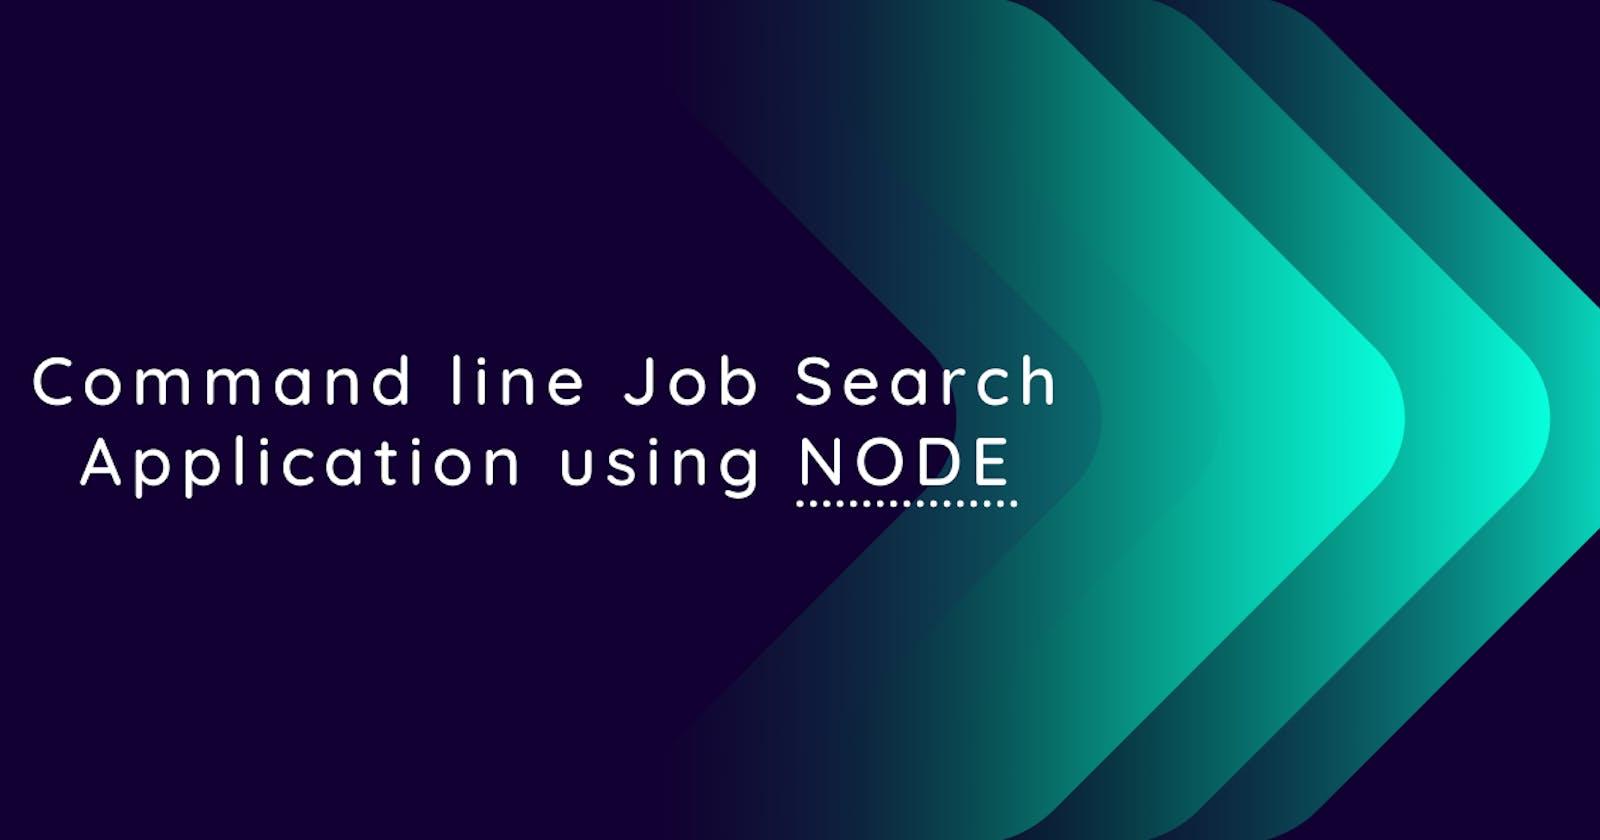 Command Line Job Search Application using Node.js